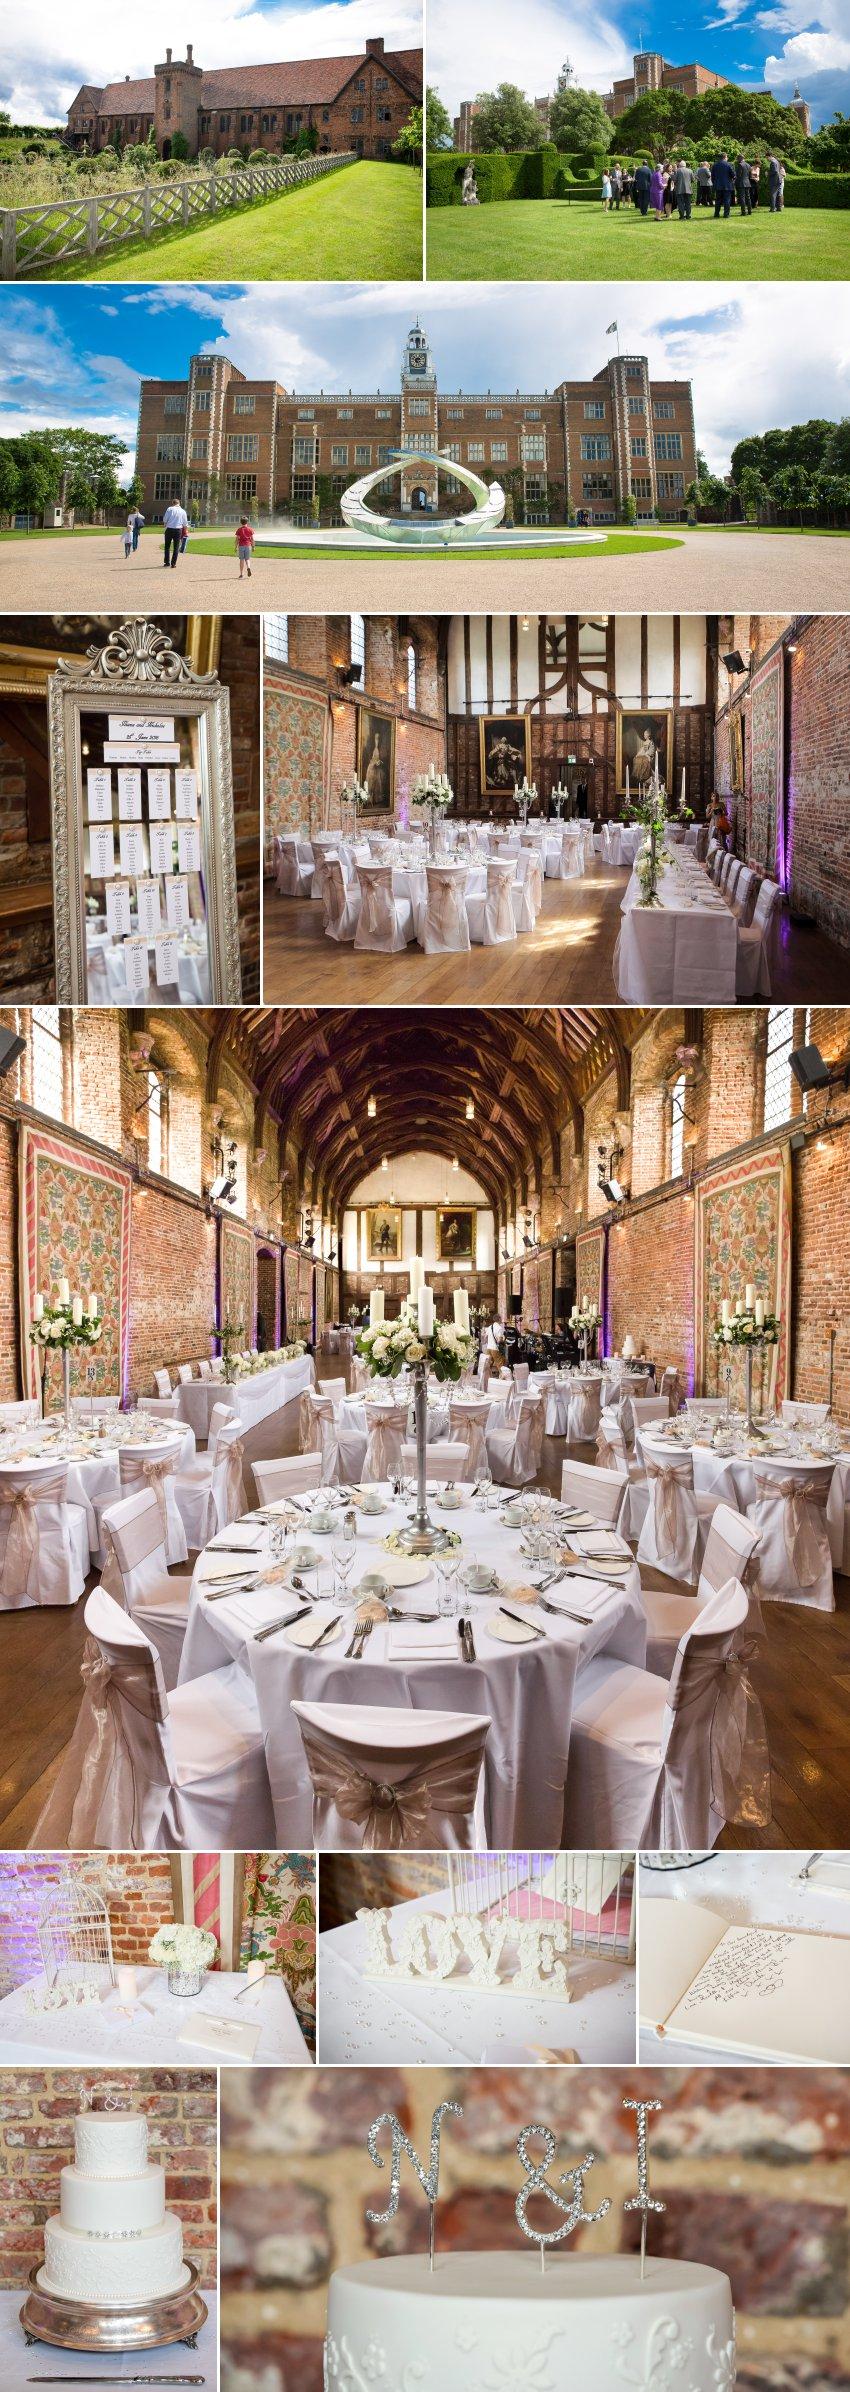 Wedding at Hatfield House 14